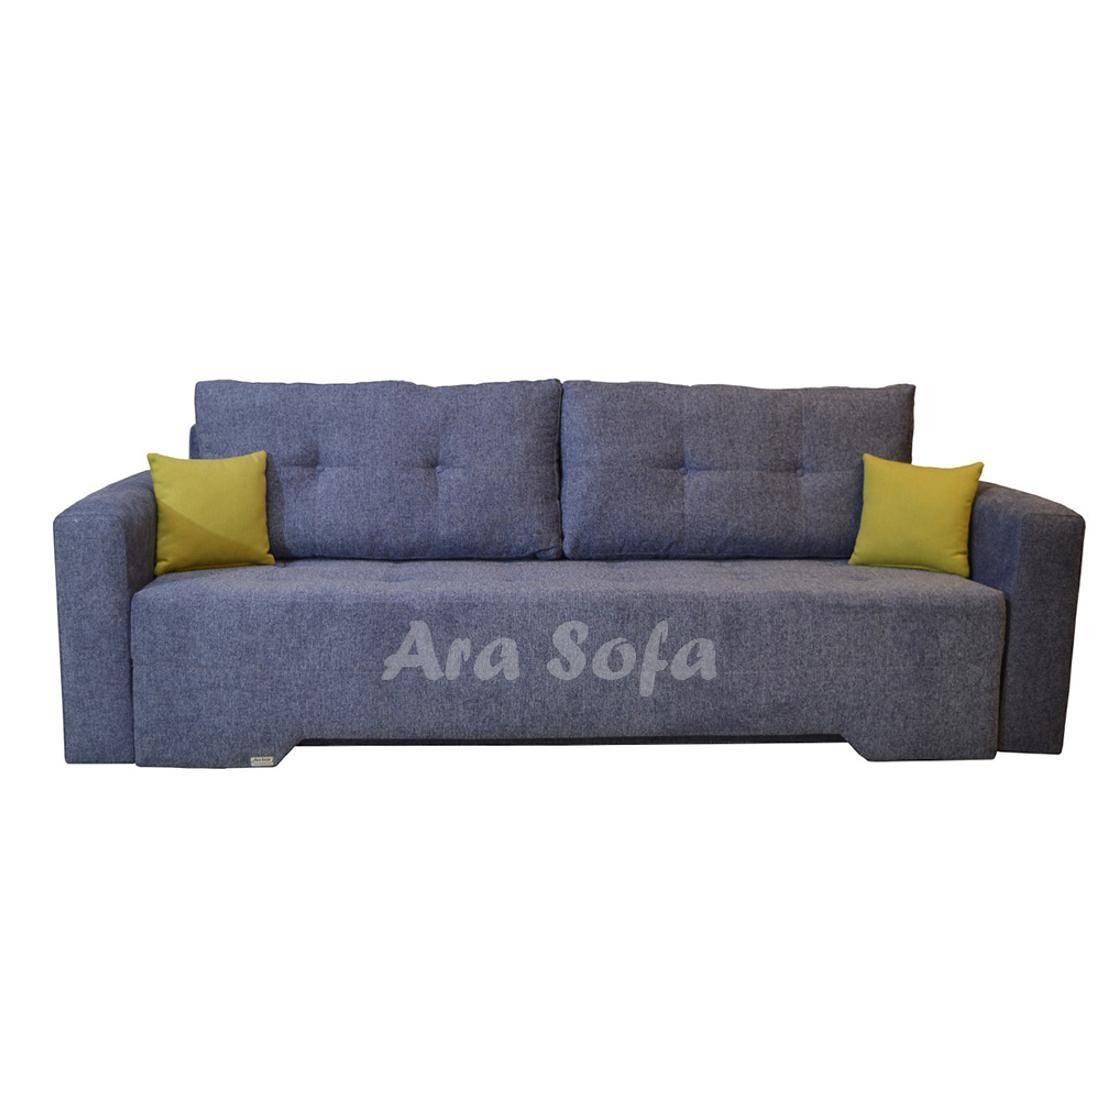 مبل-راحتی-کاناپه-تخت شو